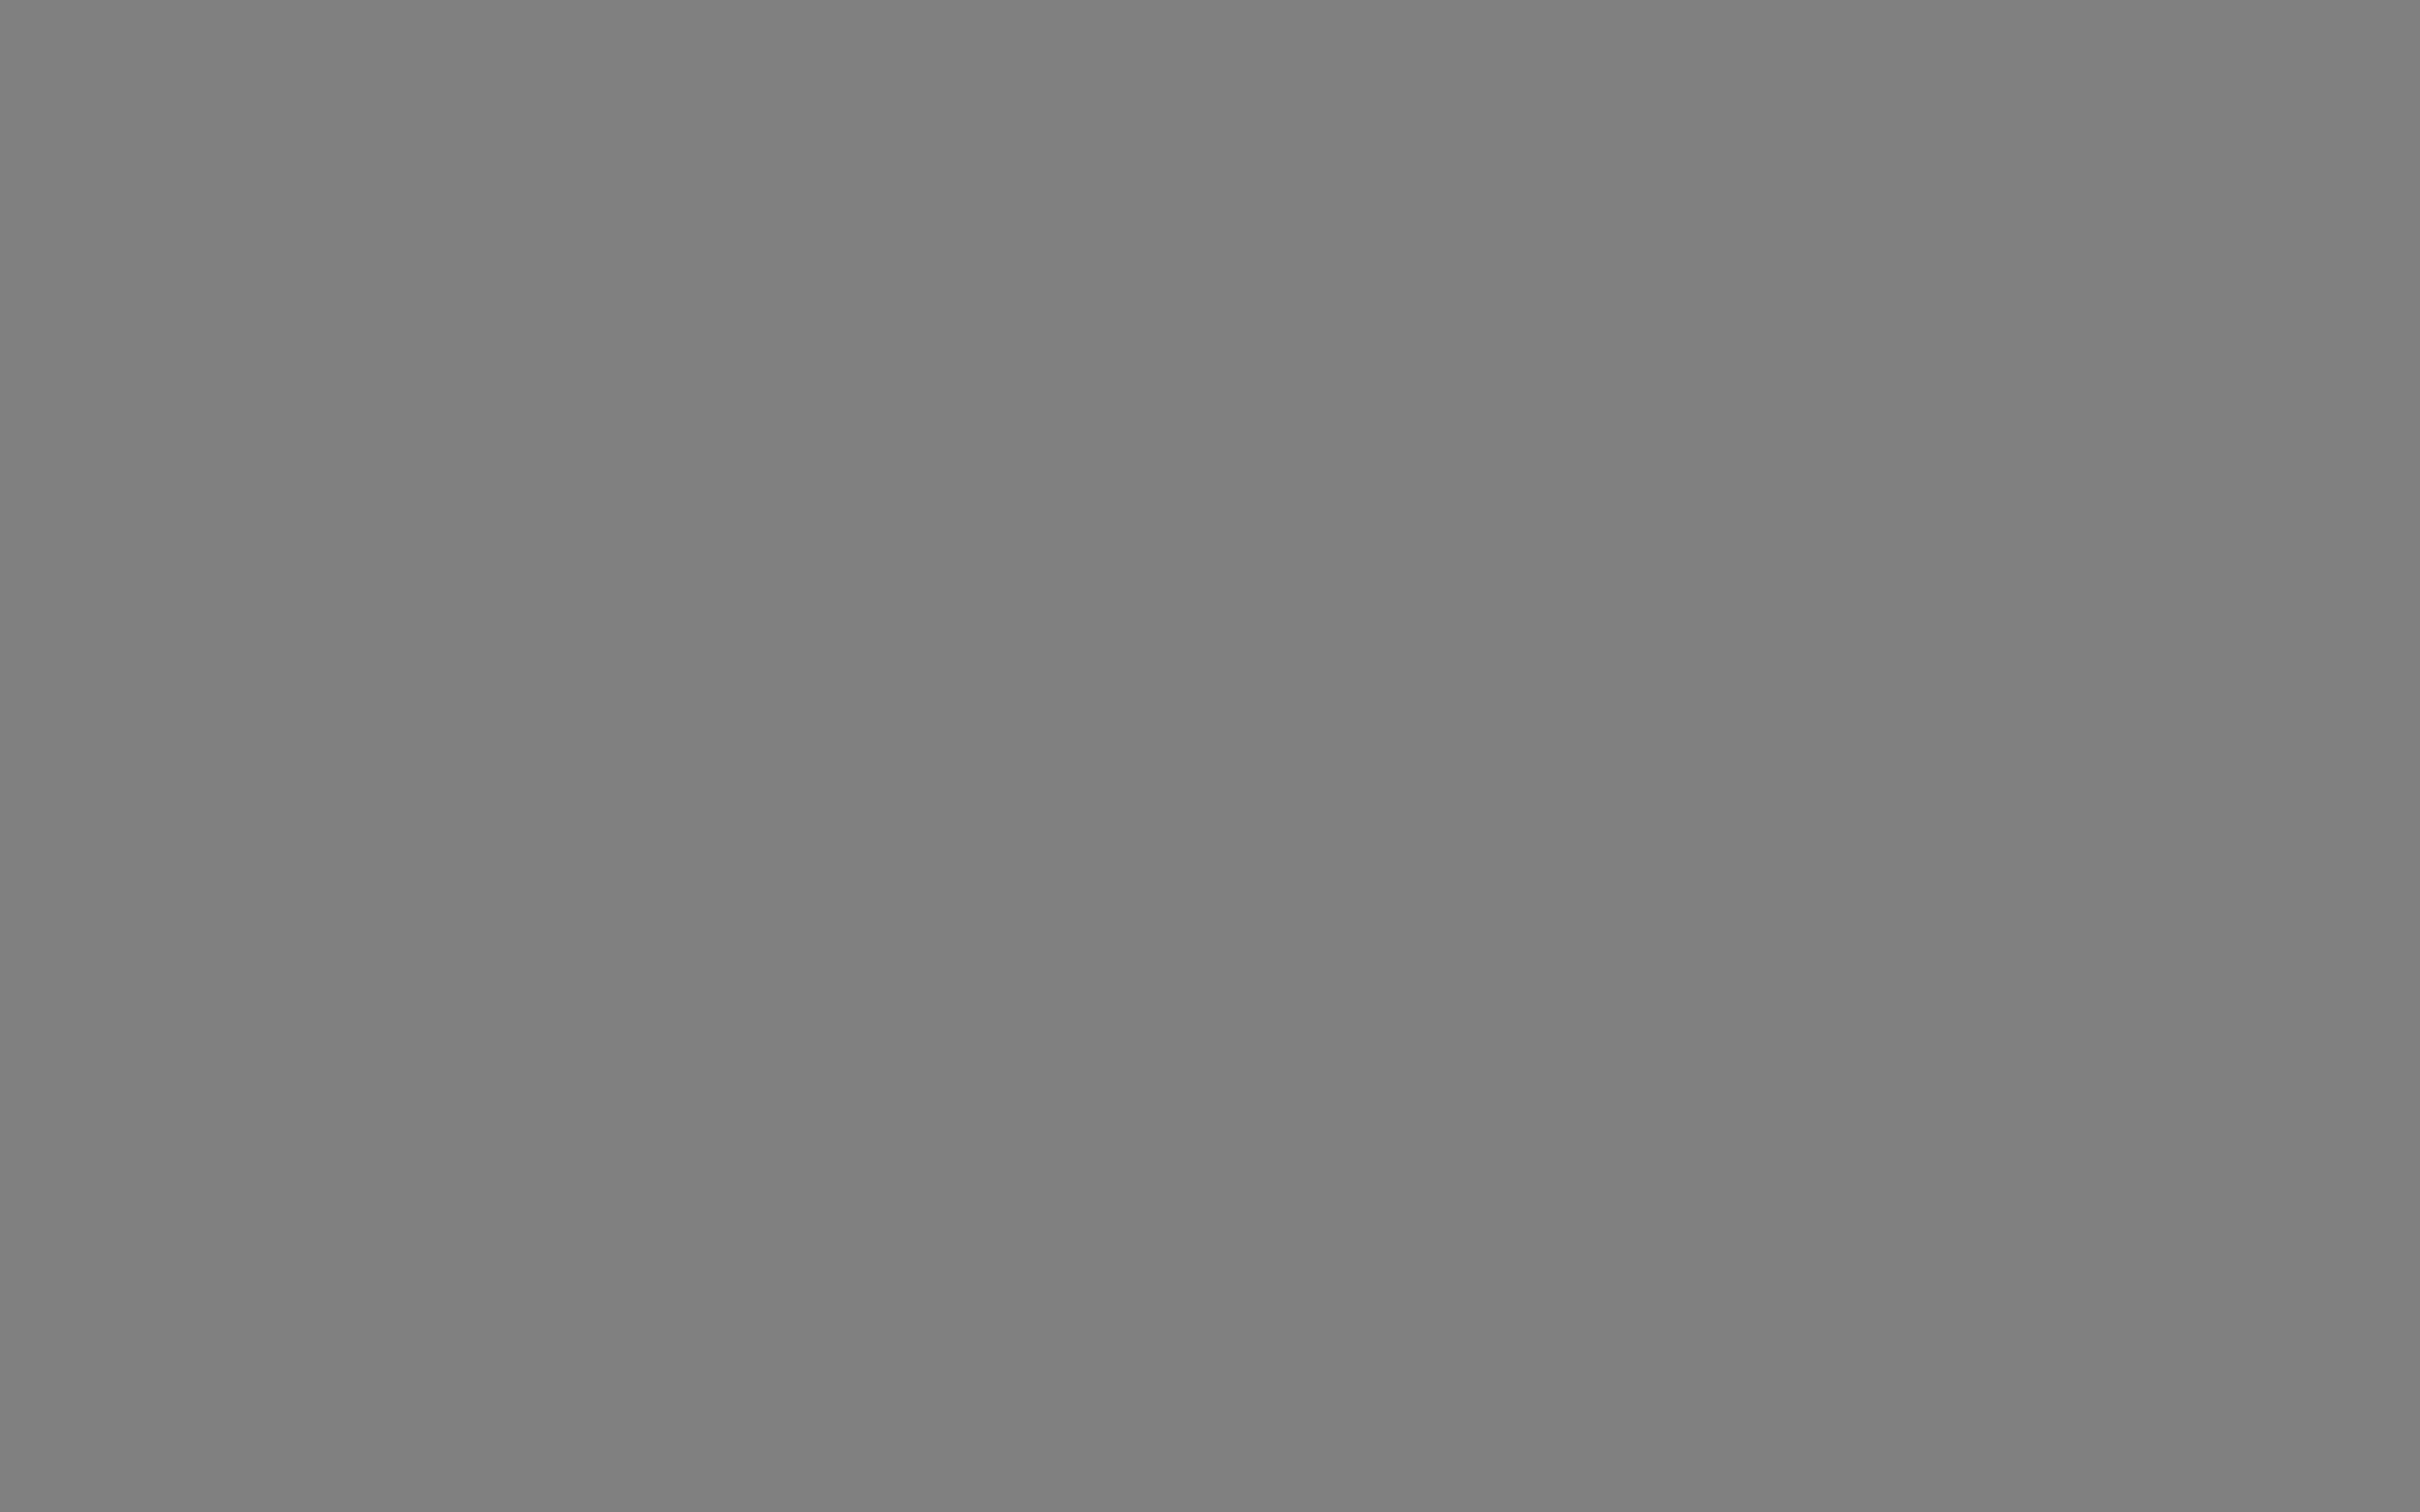 Dark Gray Color Gray Printable Coloring Pages Free Download